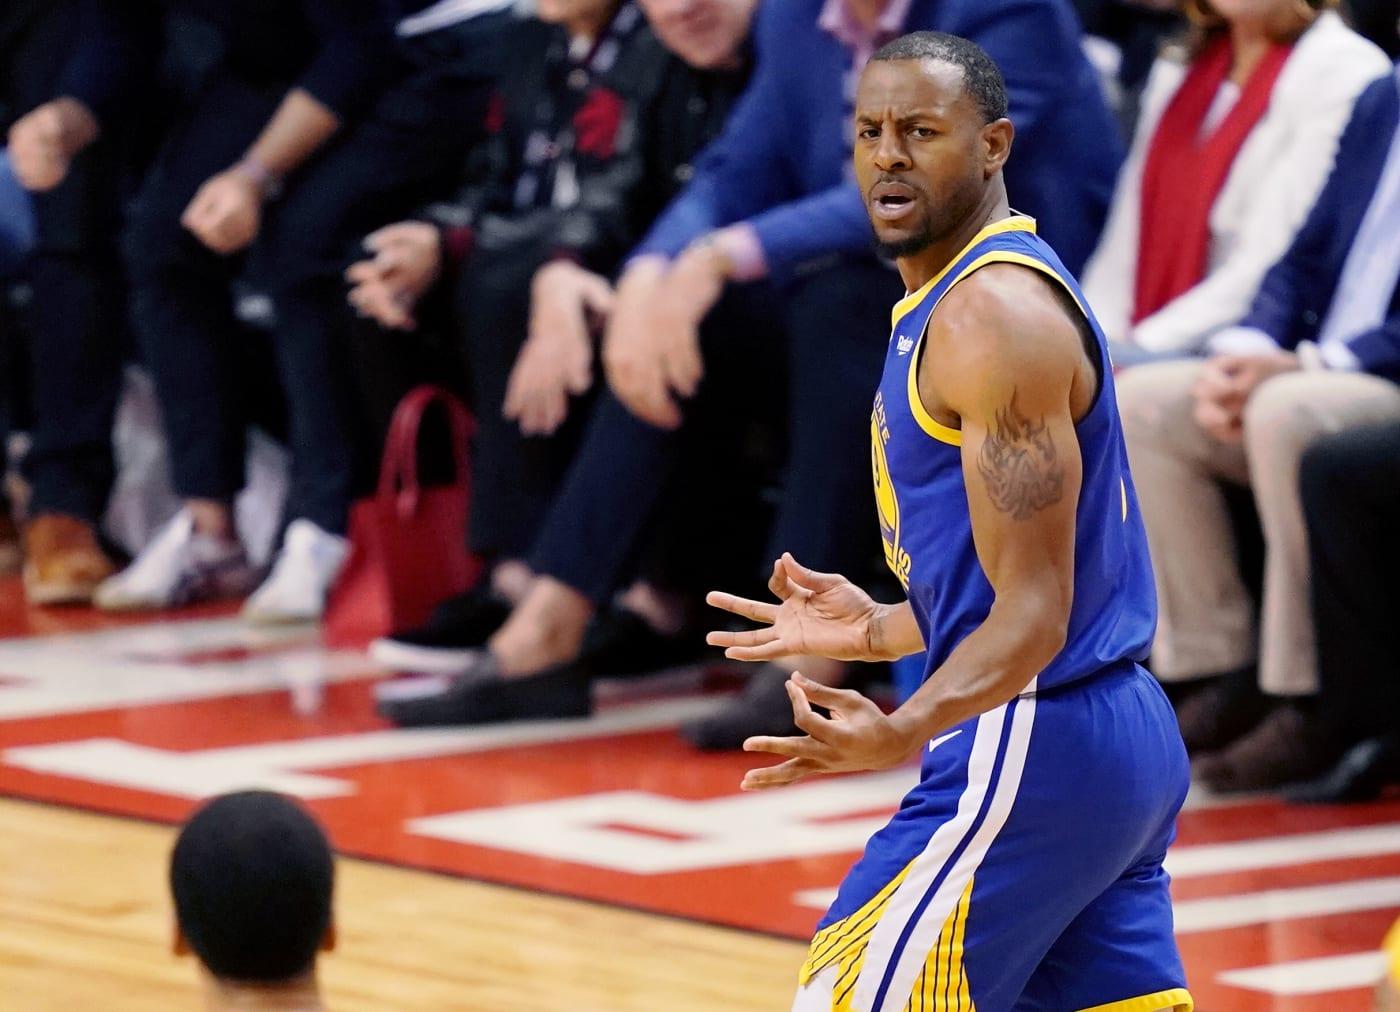 Andre Iguodala Game 2 NBA Finals 2019